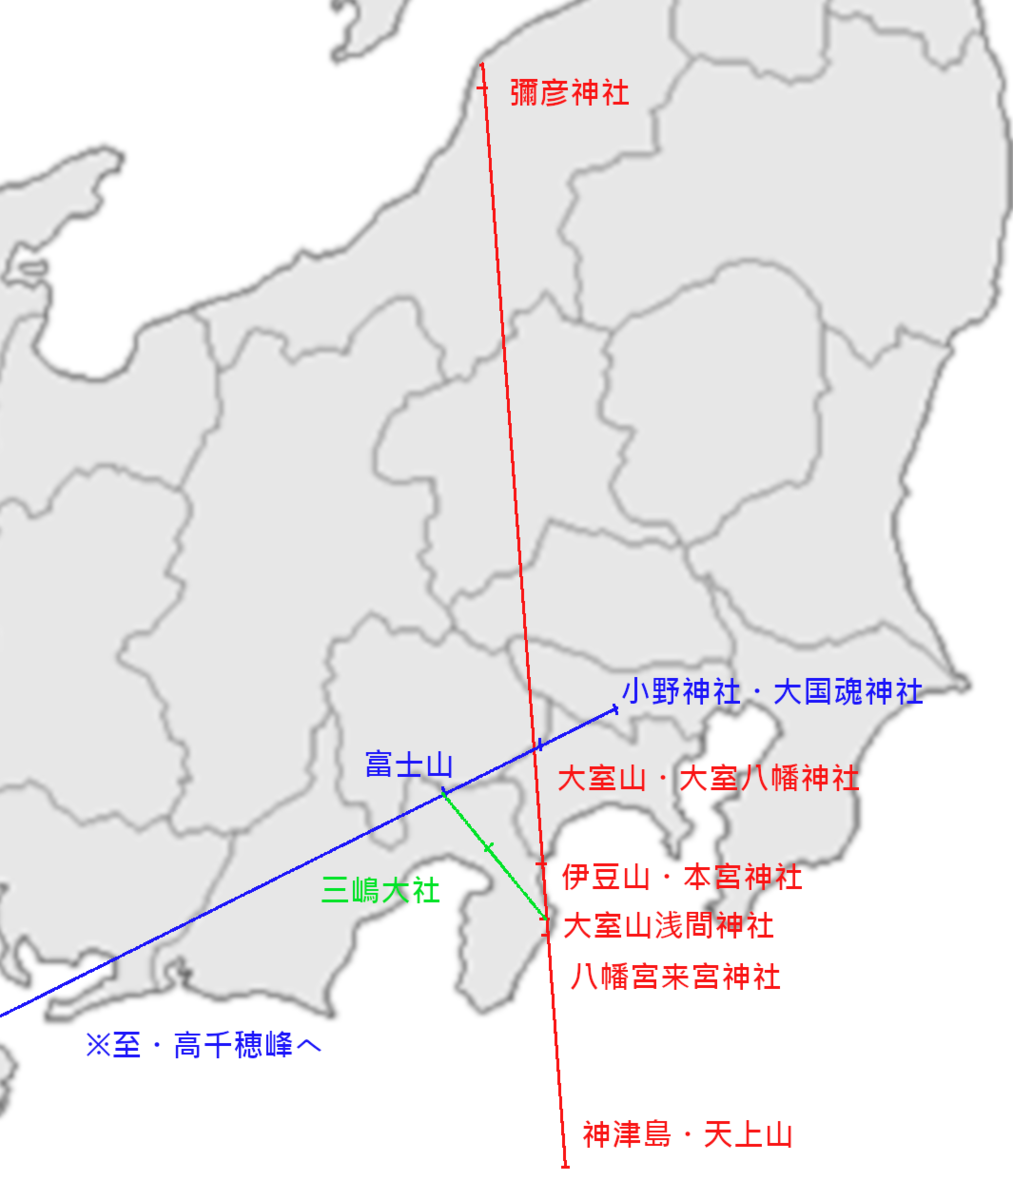 f:id:sekihotu:20190831182356p:plain